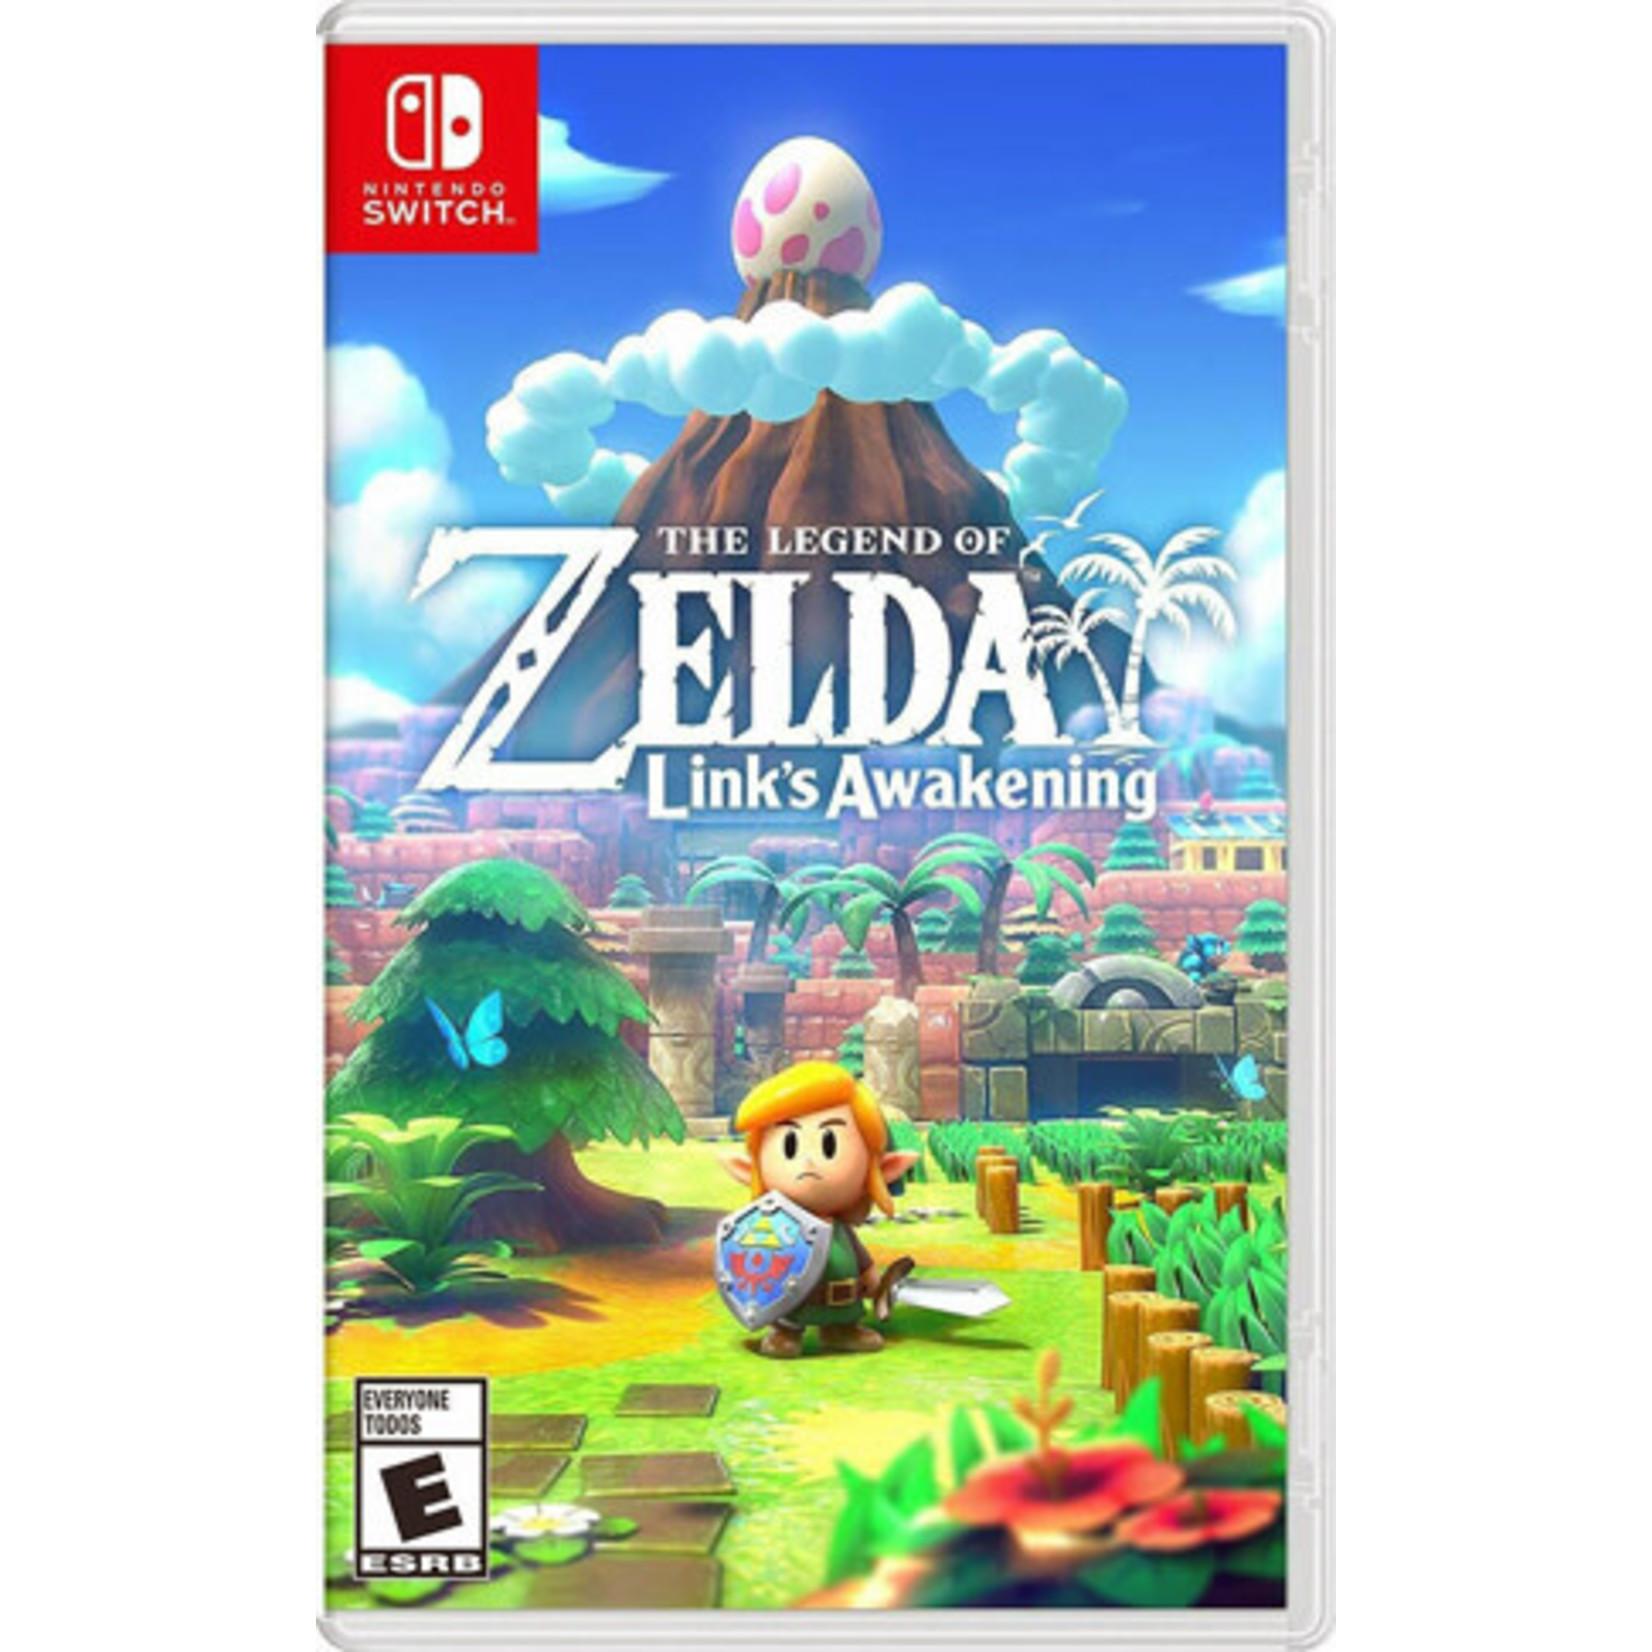 SWITCH-The Legend of Zelda: Link's Awakening